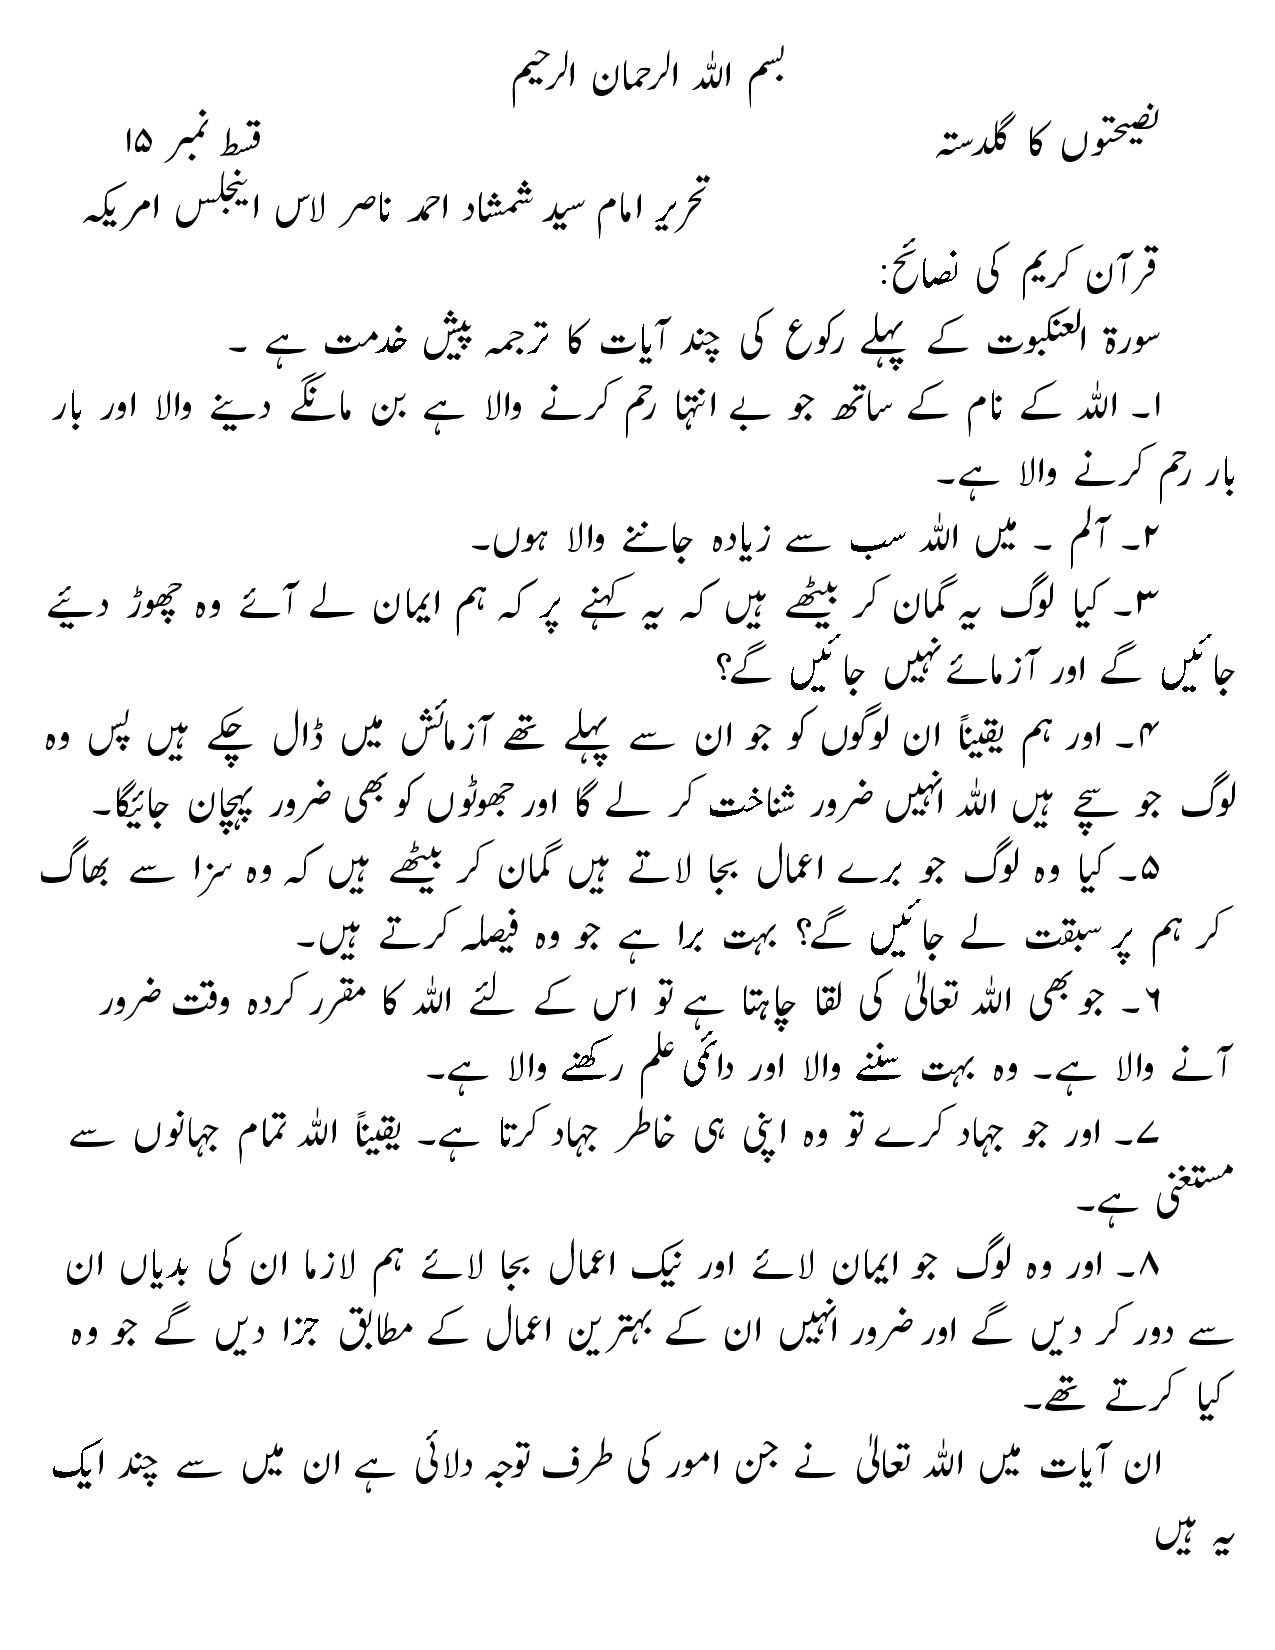 Urdu Artcile Naseehato N Ka Guldasta 15 By Imam Shamshad